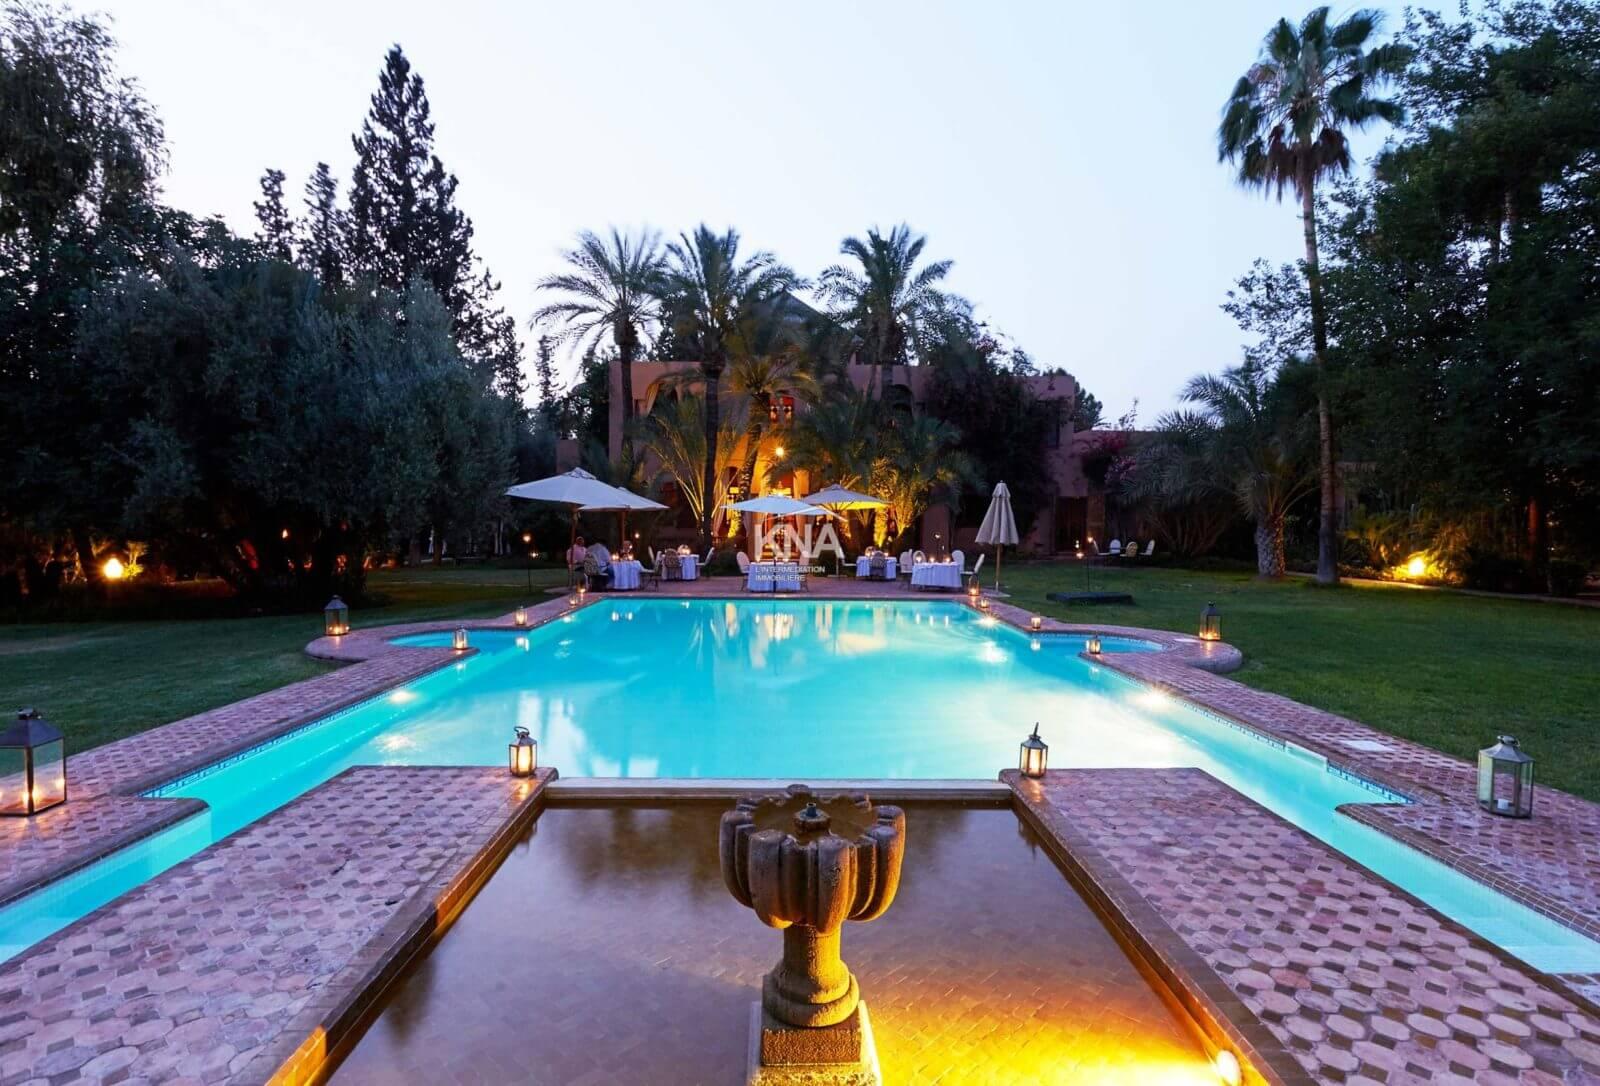 vente villa marrakech Maroc